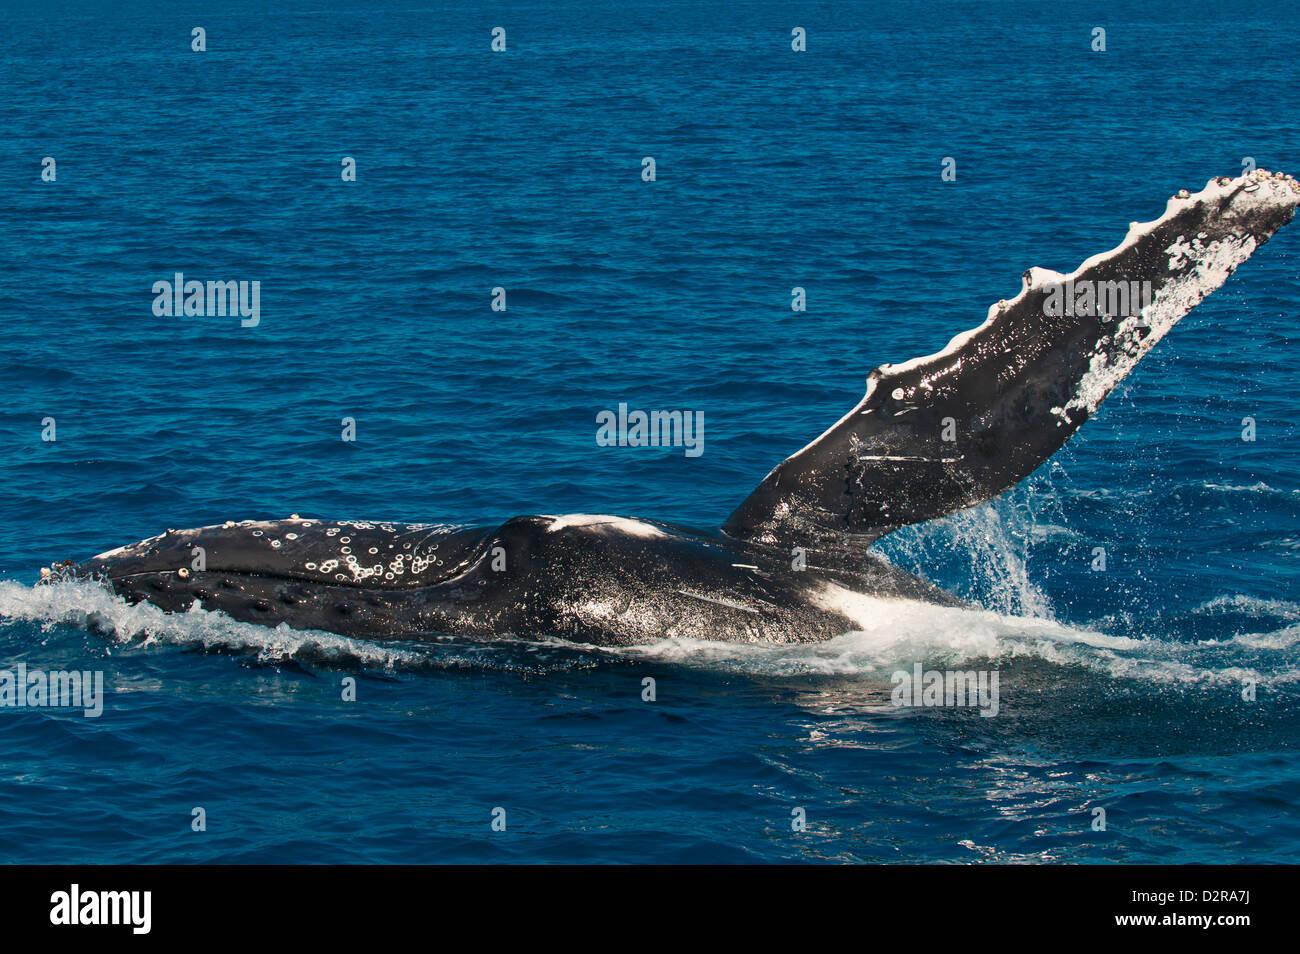 Humpback whale (Megaptera novaeangliae) in Harvey Bay, Queensland, Australia, Pacific - Stock Image